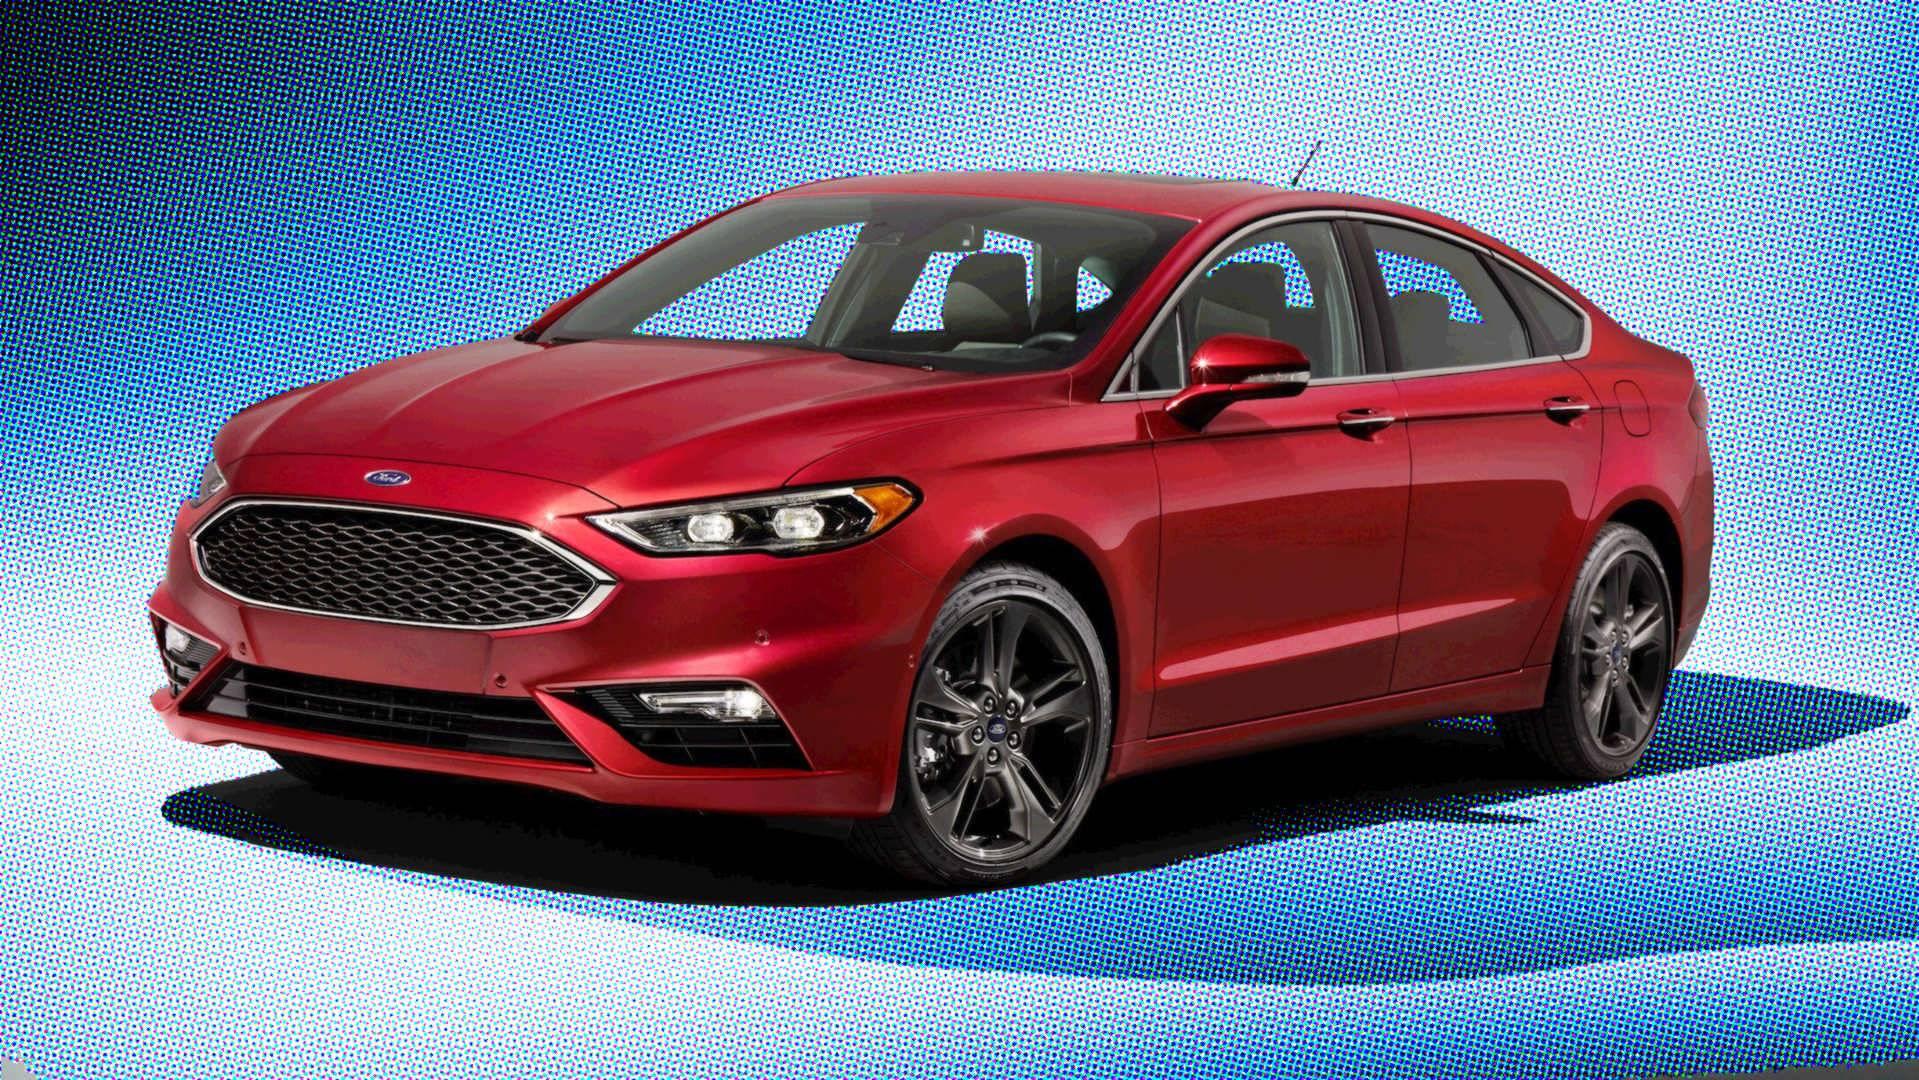 10 Most Powerful Sedans Under 40 000